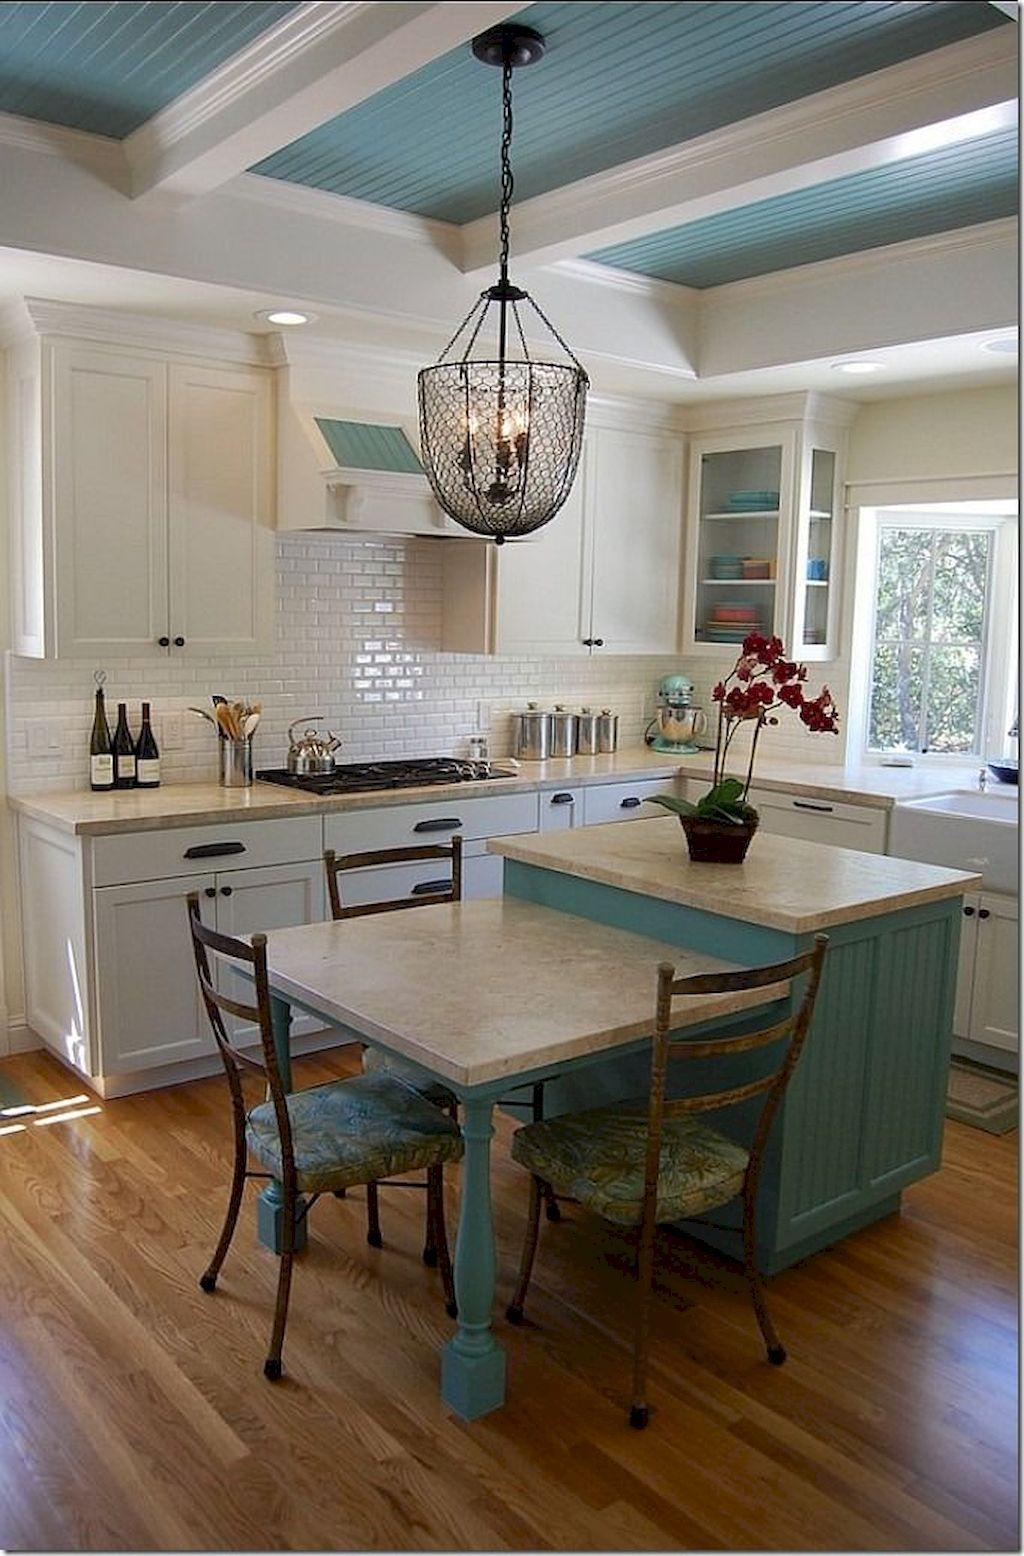 Stunning Small Island Kitchen Table Ideas   Home kitchens ...